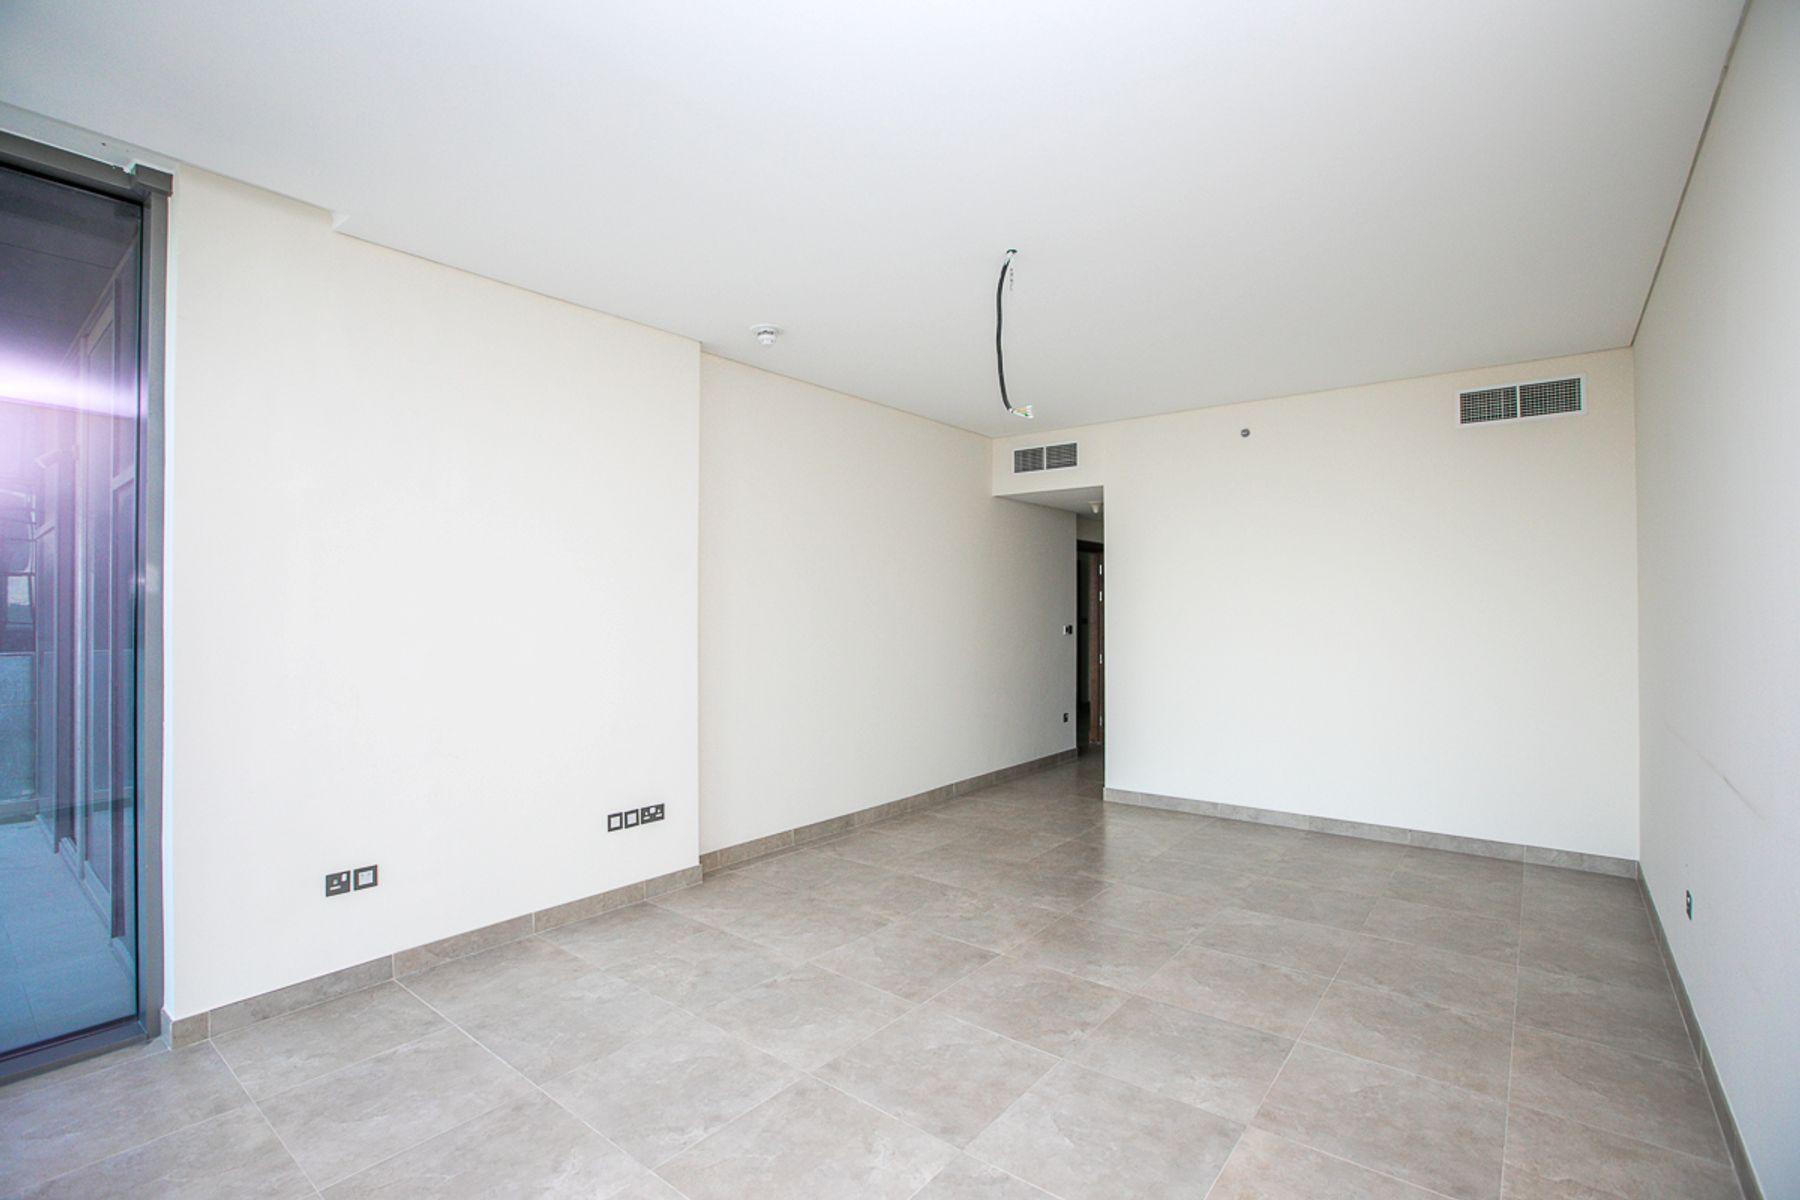 Apartment for Rent in Al Fattan Sky Tower 1 - Umm Ramool